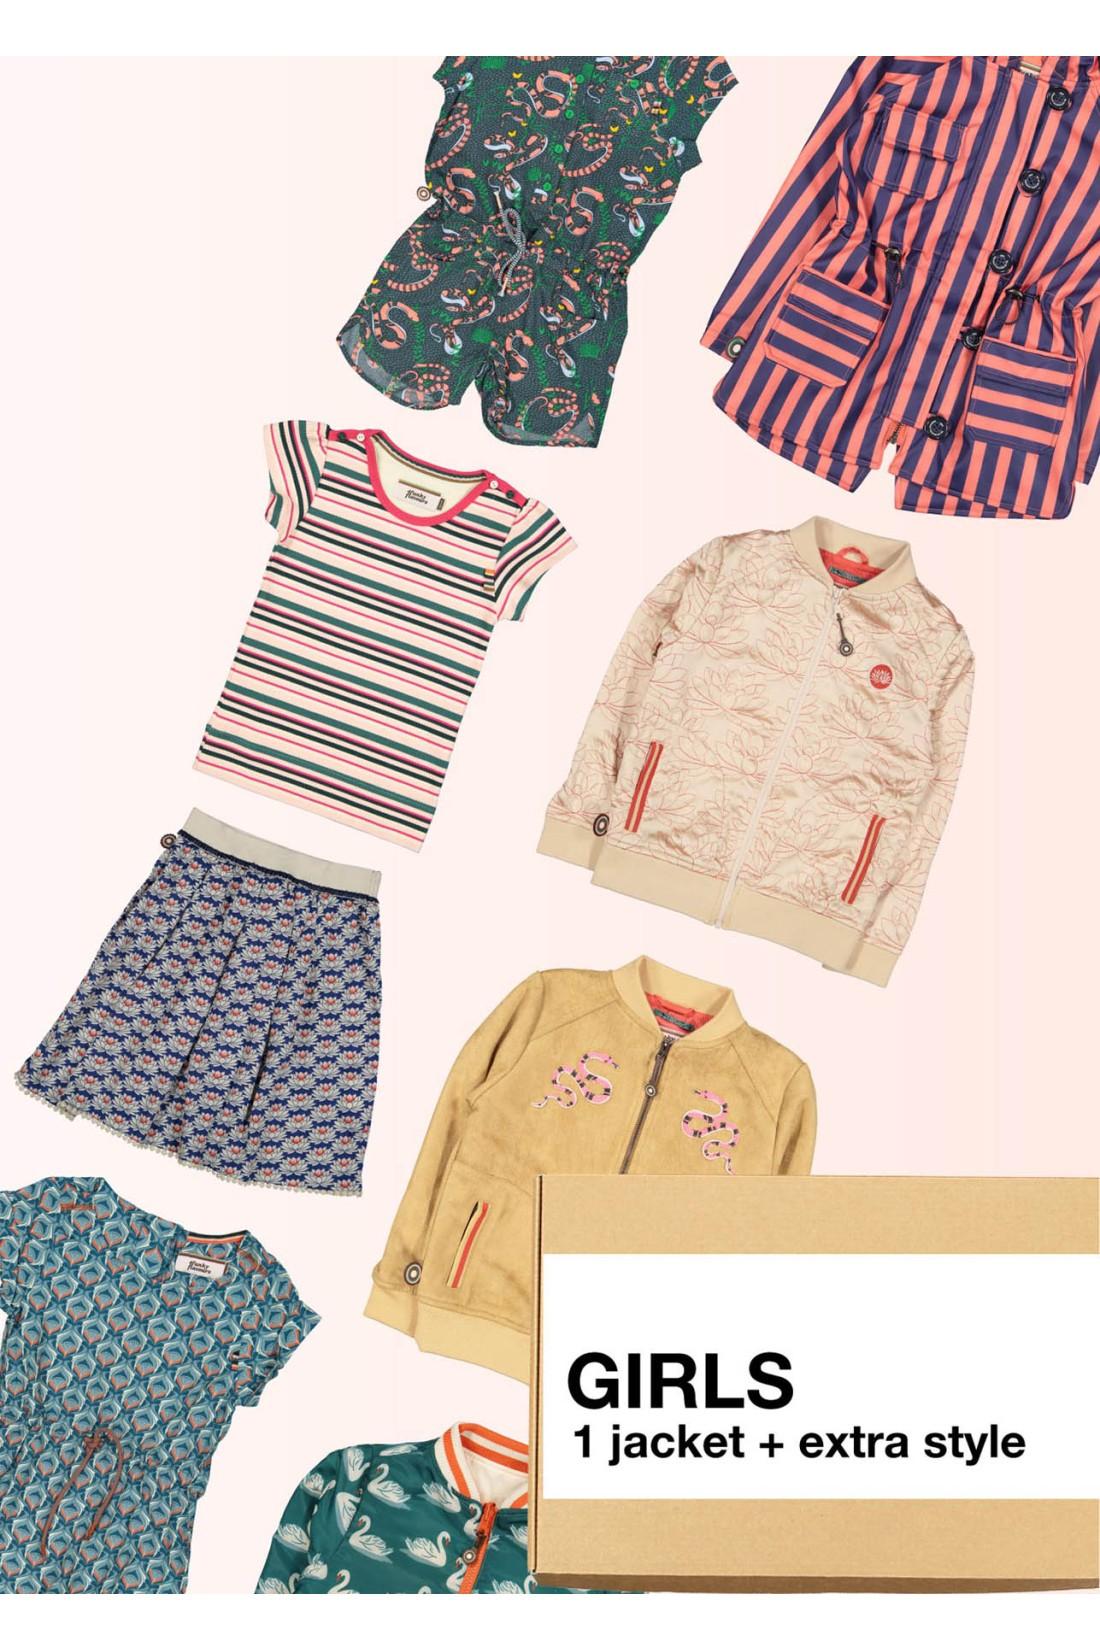 Surprise Box Girl - Summer Jacket + Extra Style